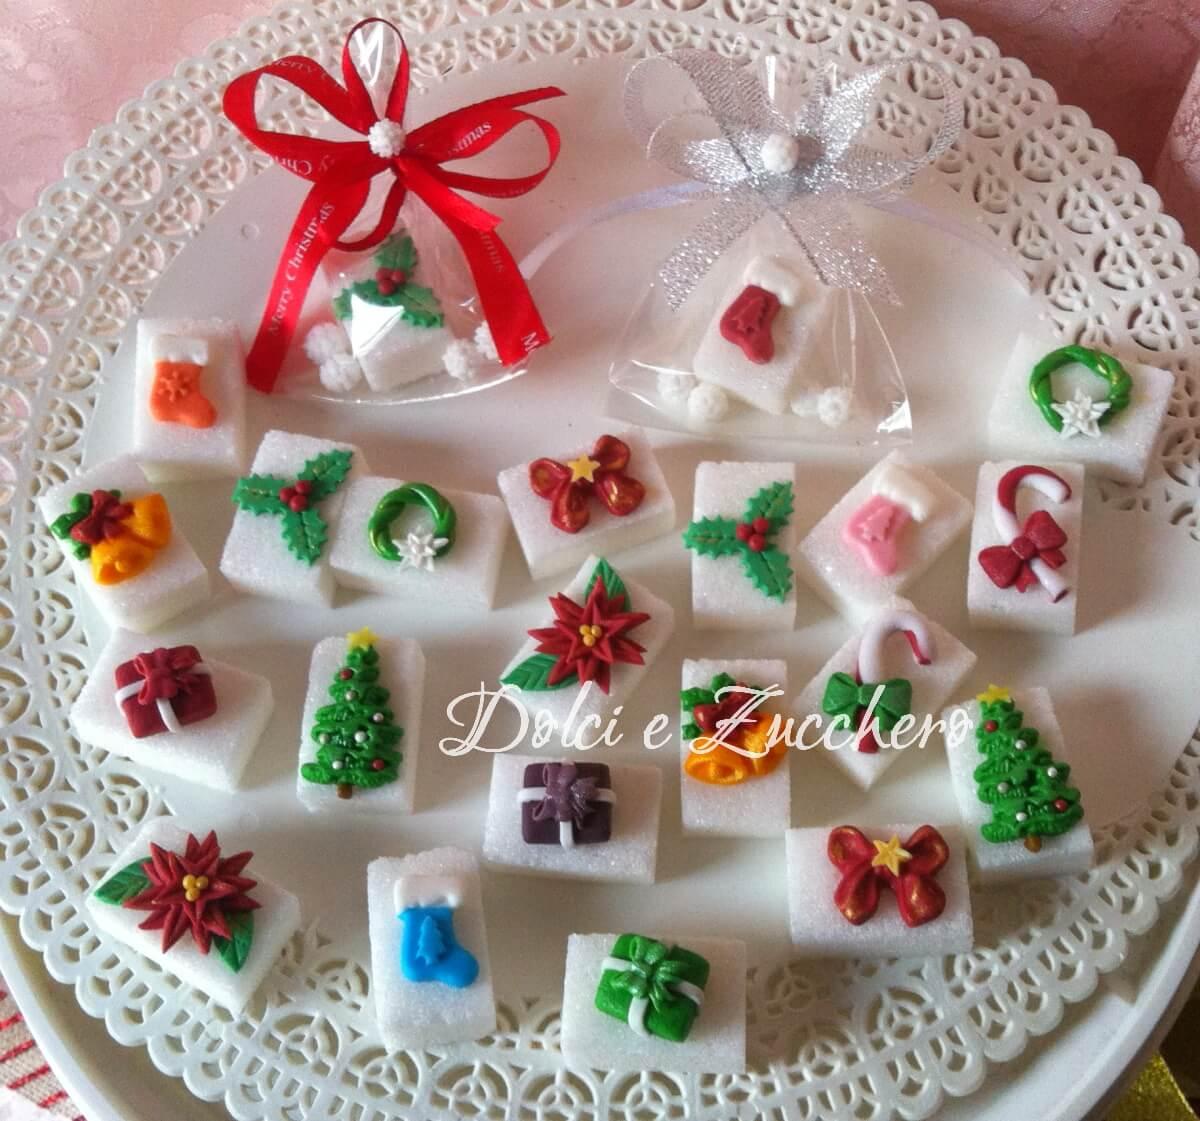 Idee di natale di zucchero originali dolci e zucchero - Idee decorative per natale ...